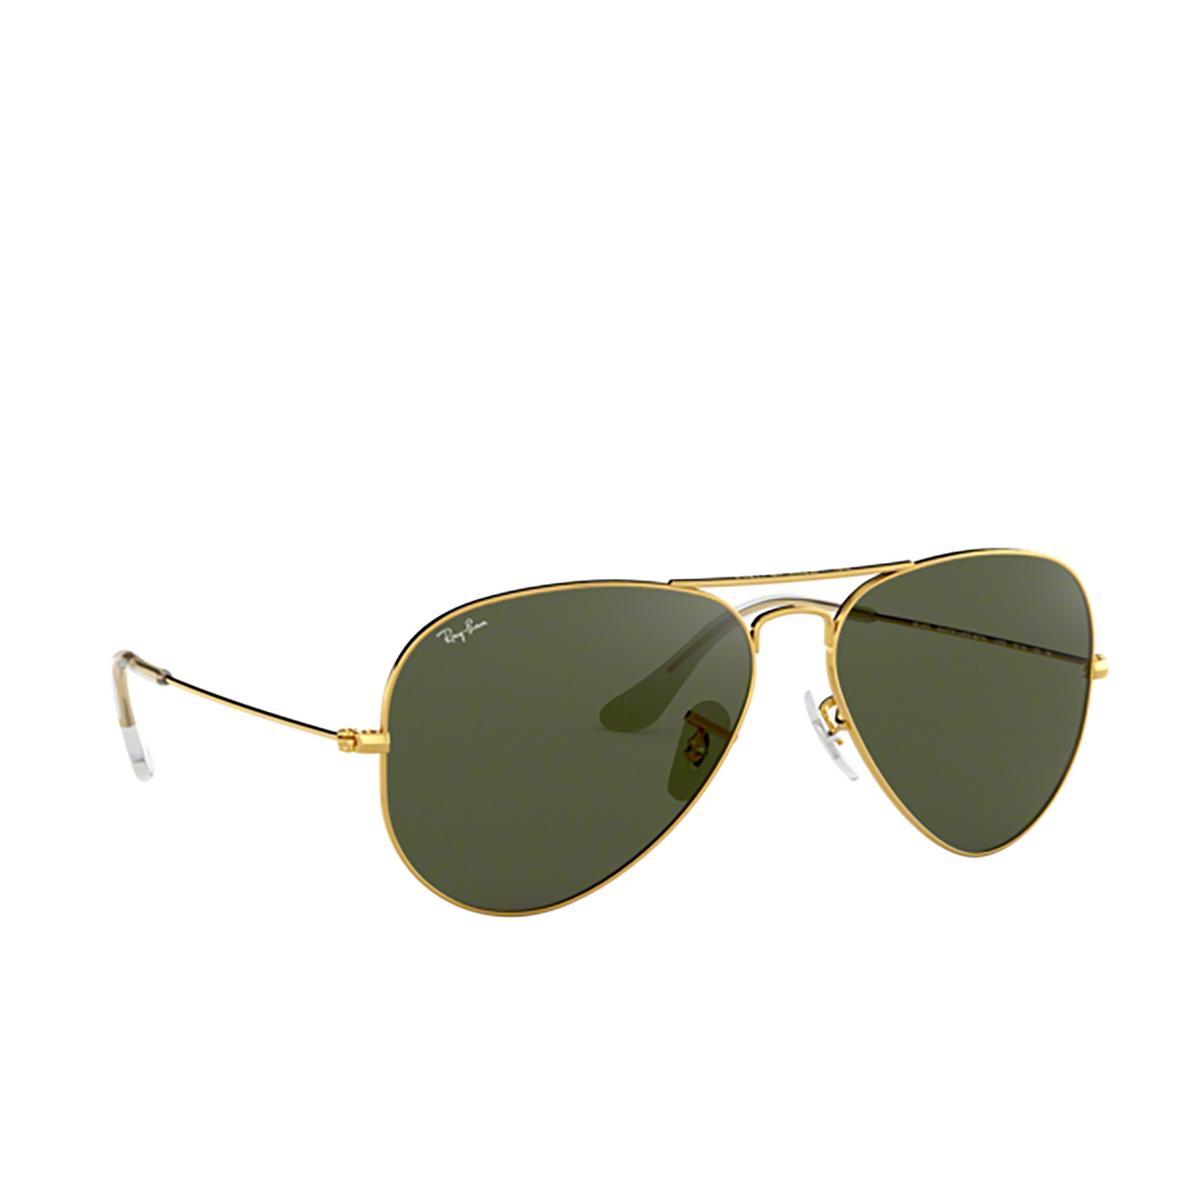 Ray-Ban® Aviator Sunglasses: Aviator Large Metal RB3025 color Arista L0205.